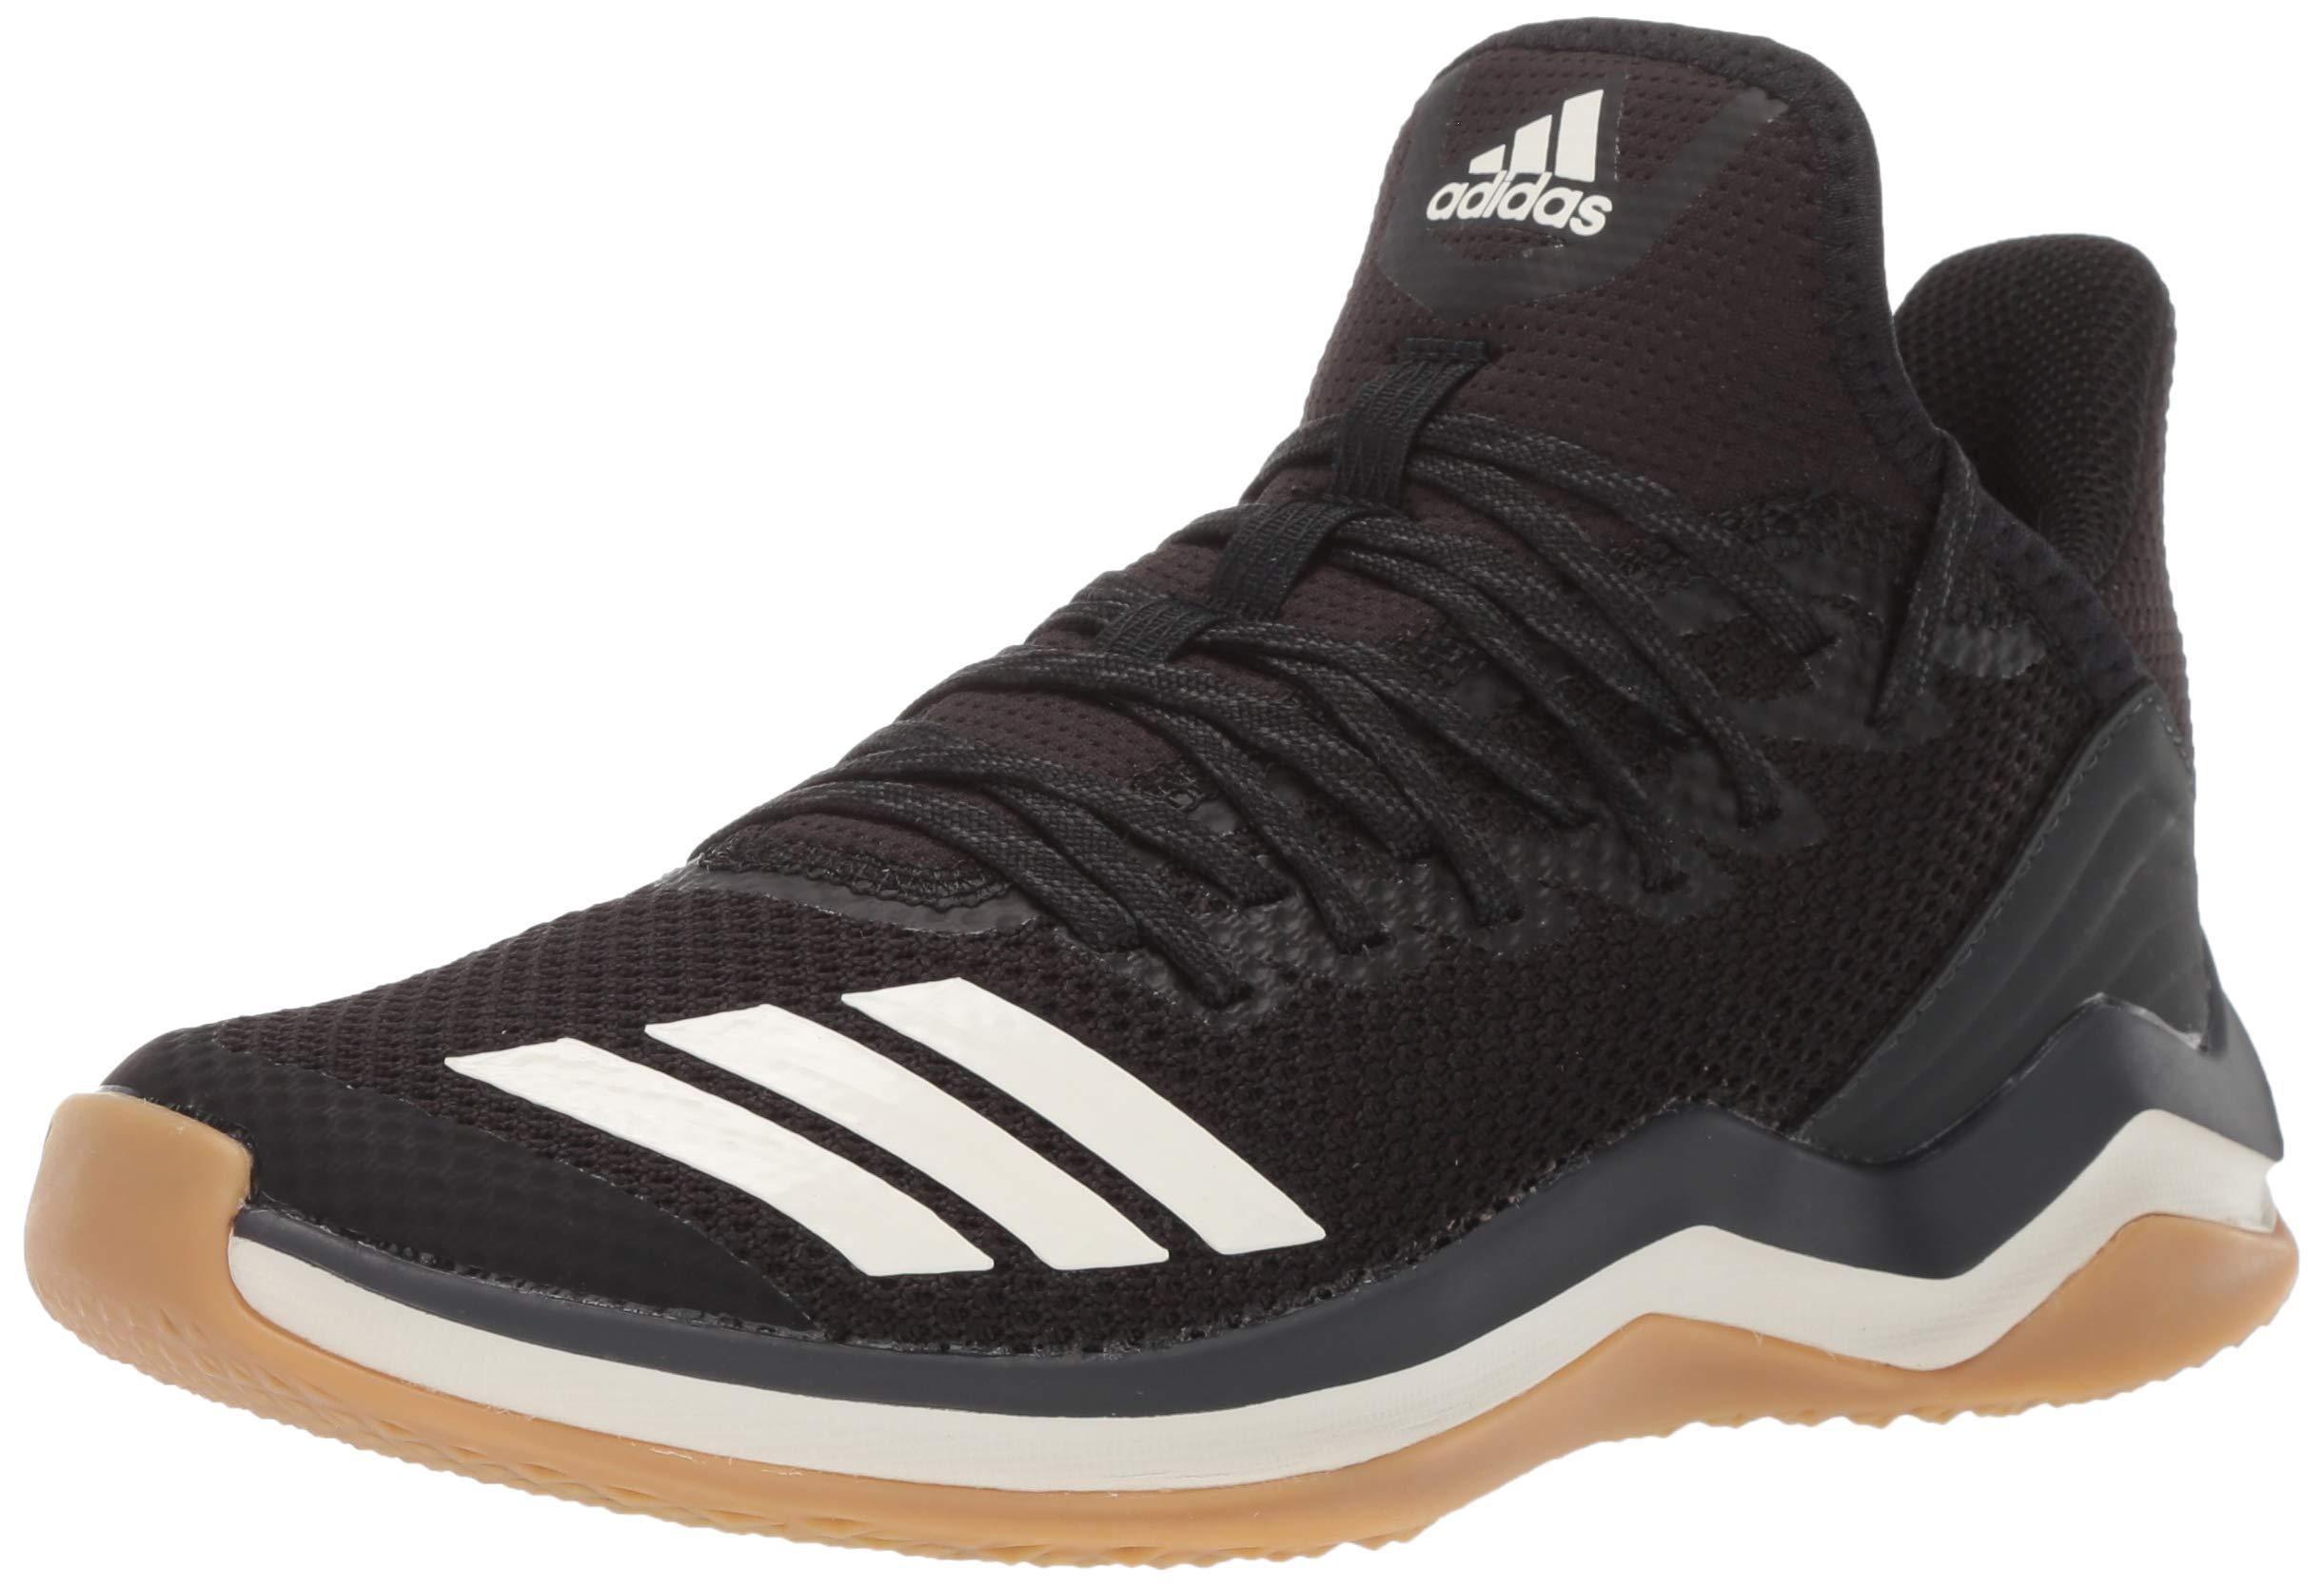 adidas Men's Icon 4 Baseball Shoe, BlackCloud WhiteCarbon, 13 M US